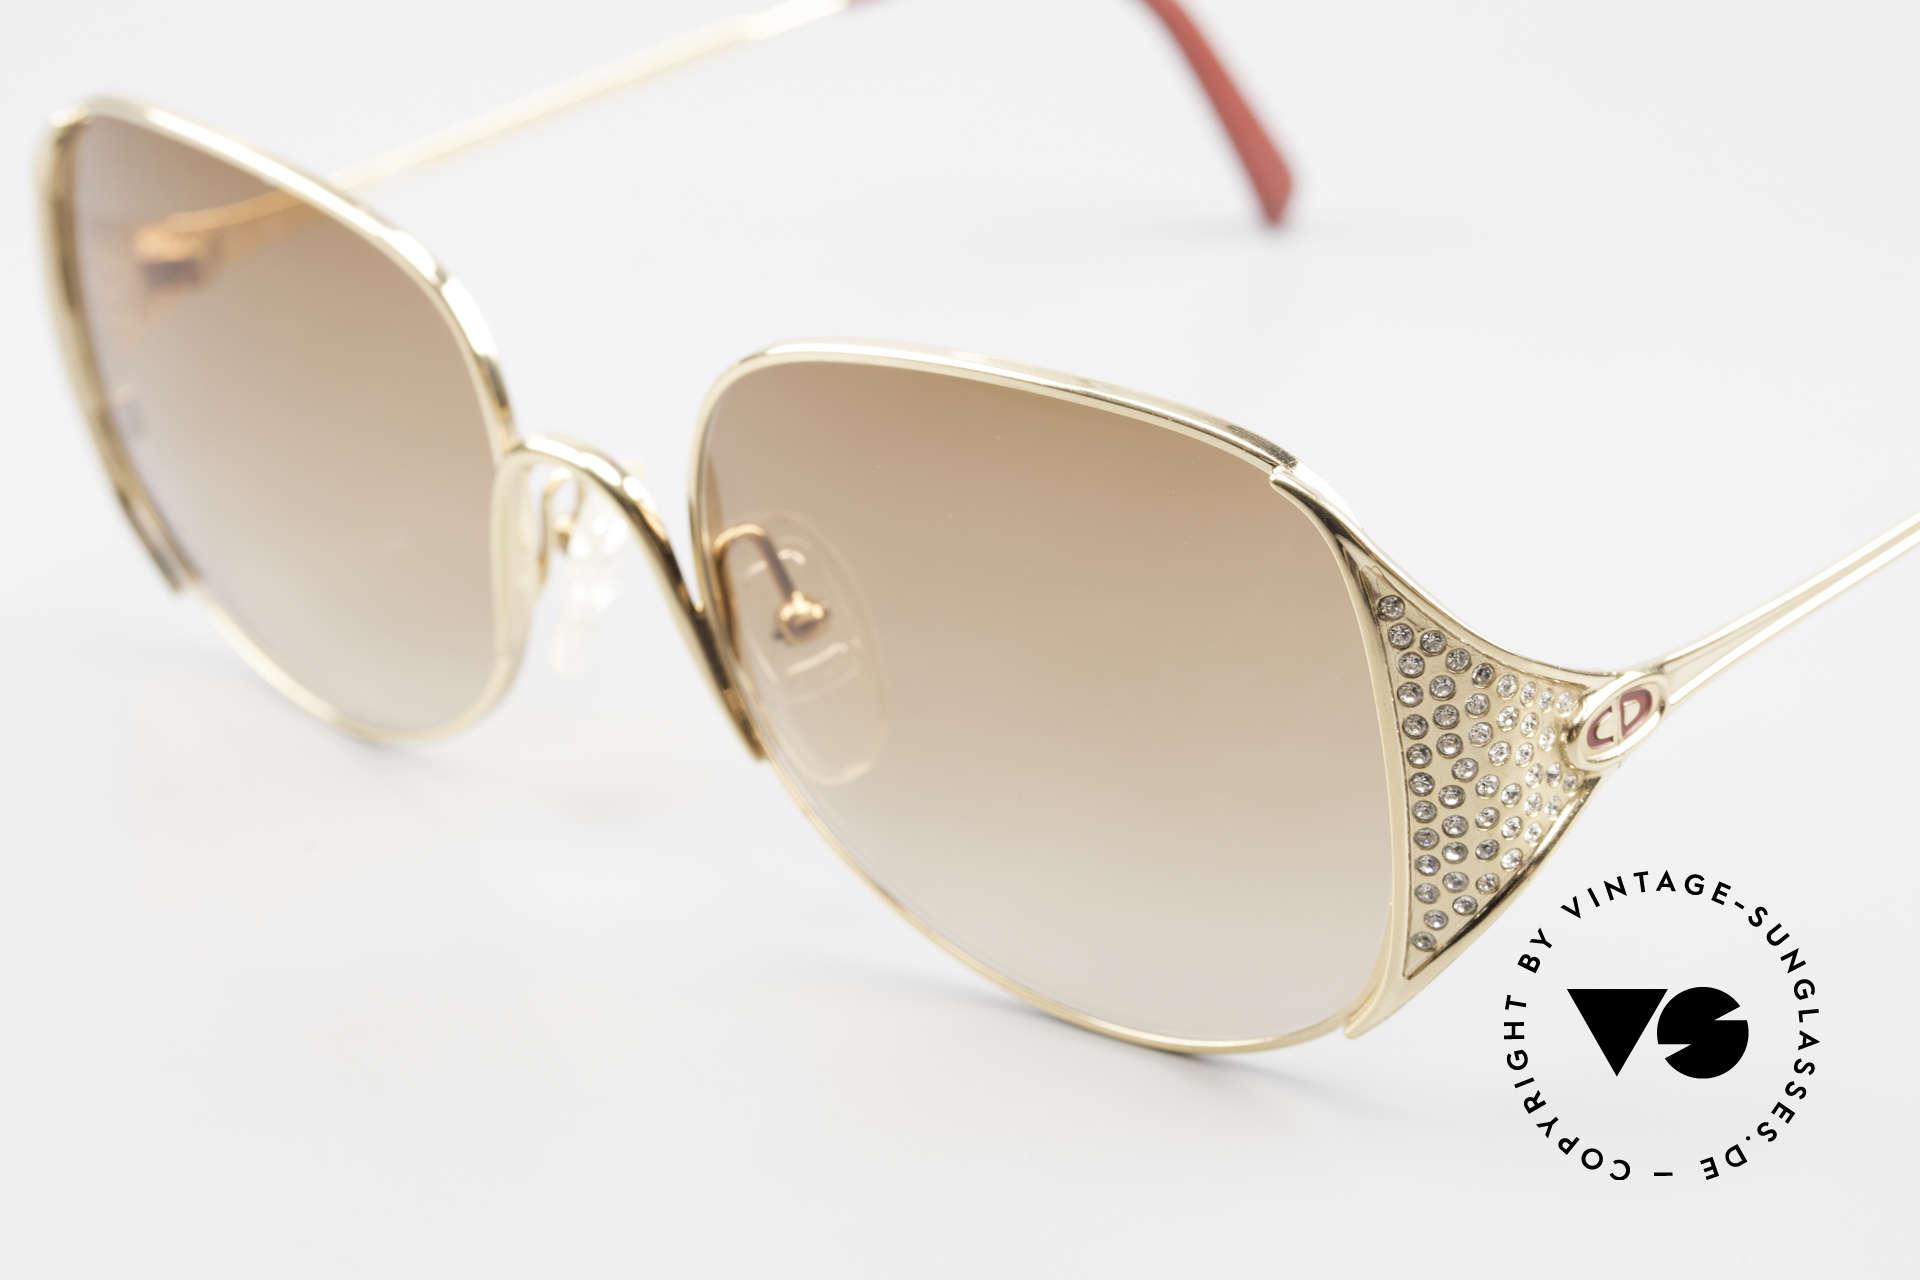 Christian Dior 2362 Ladies Sunglasses Rhinestone, unworn; like all our rare vintage designer sunglasses, Made for Women